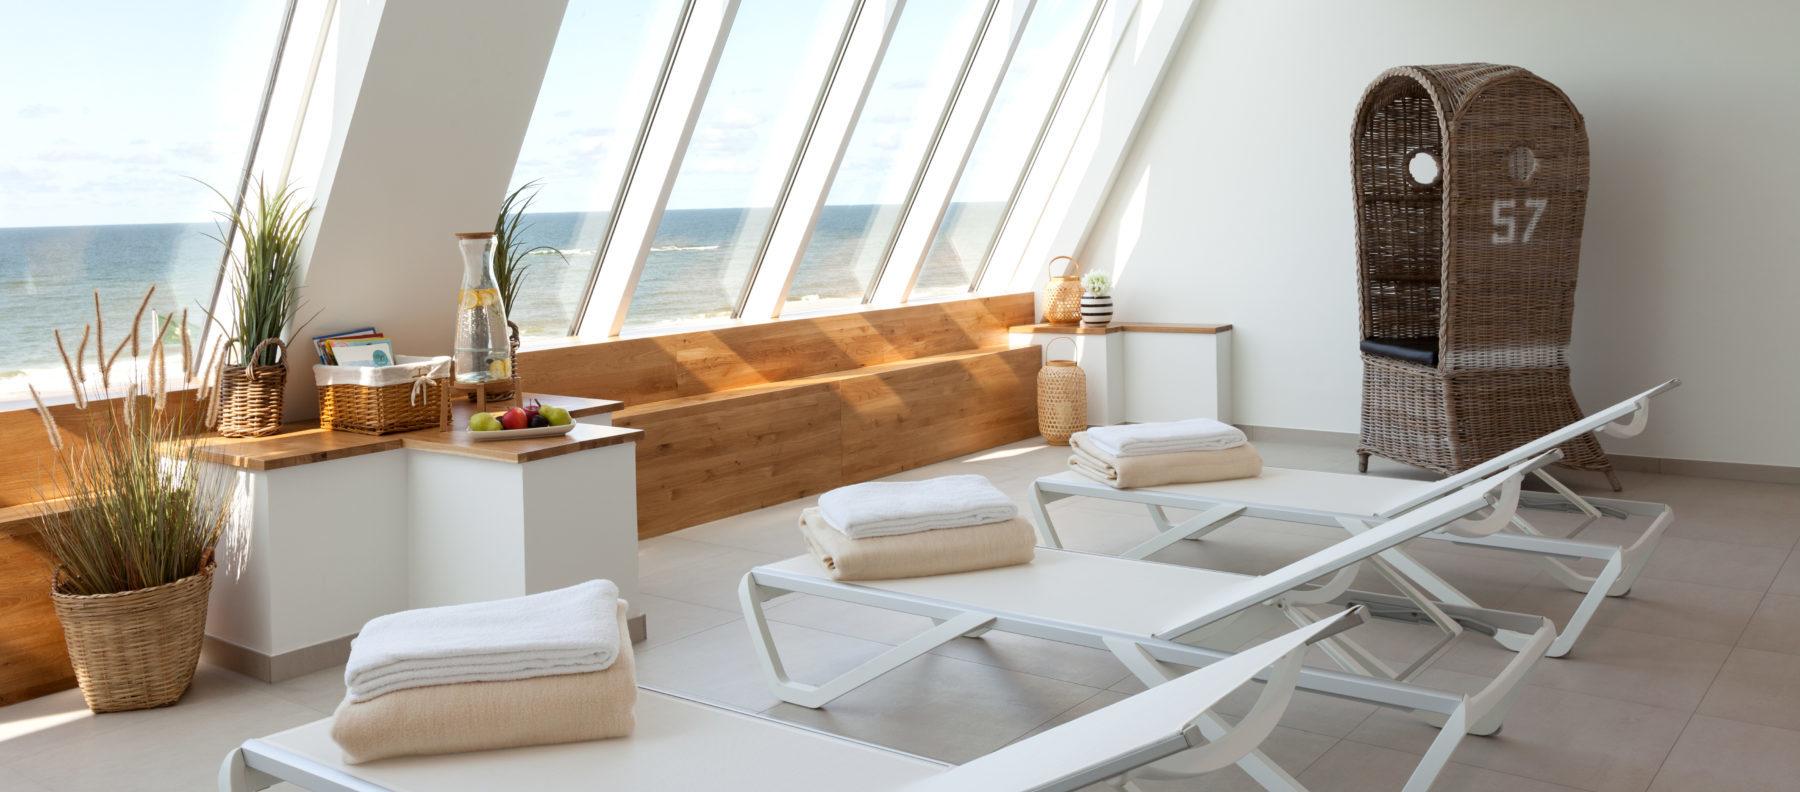 Spa Lounge Wyn Strandhotel Sylt Wellness